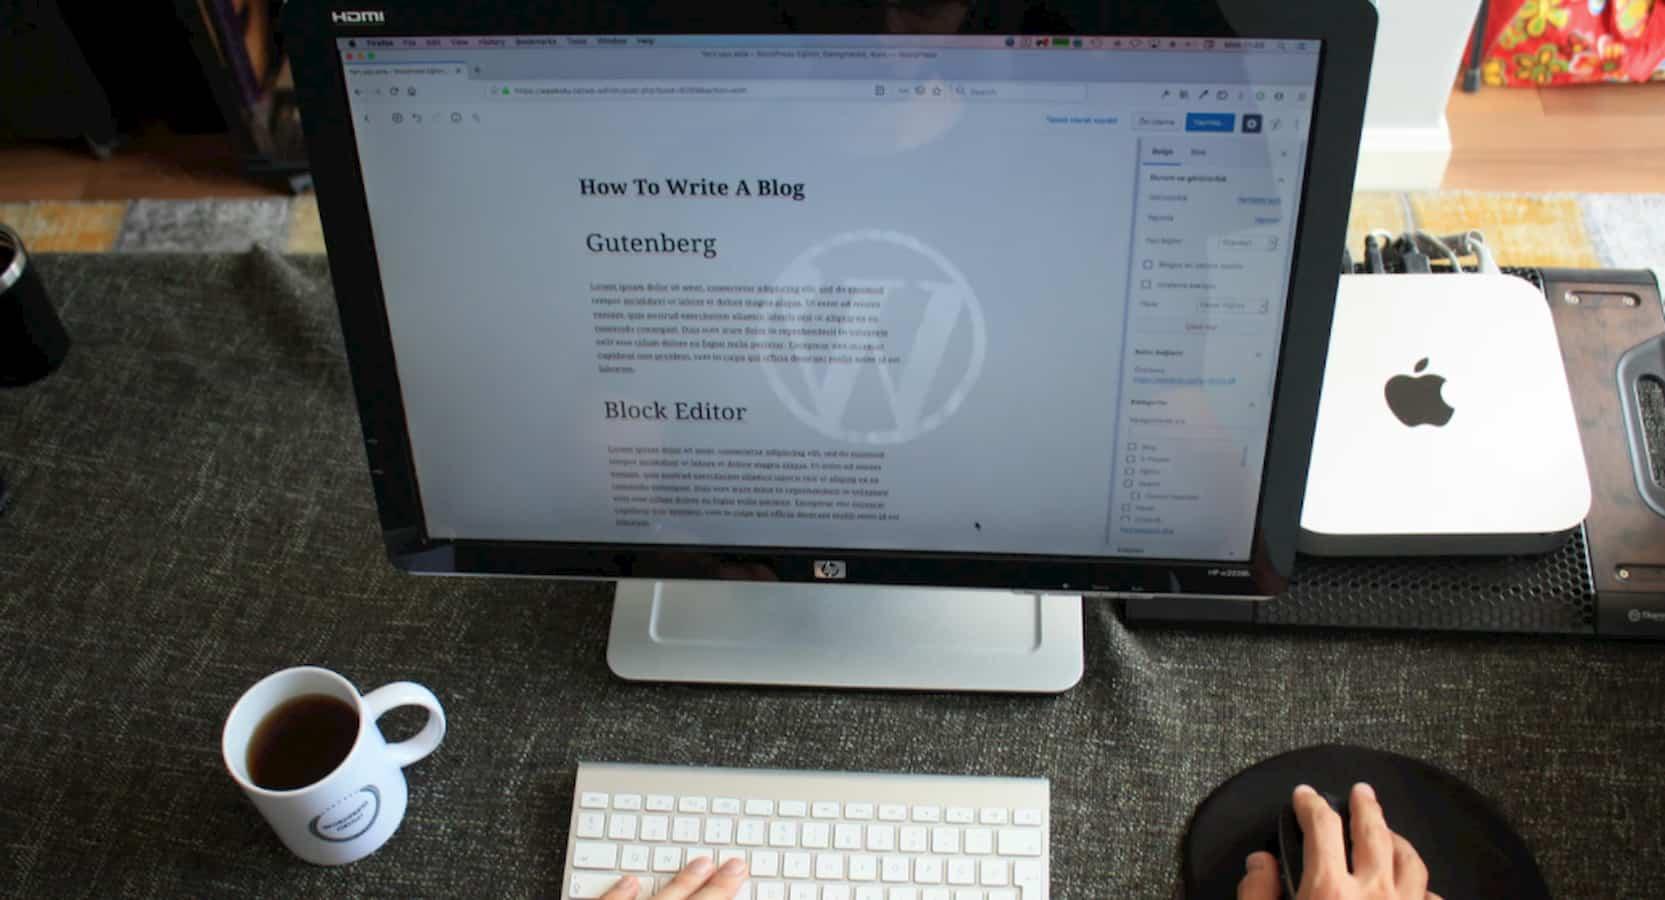 wordpress on a monitor